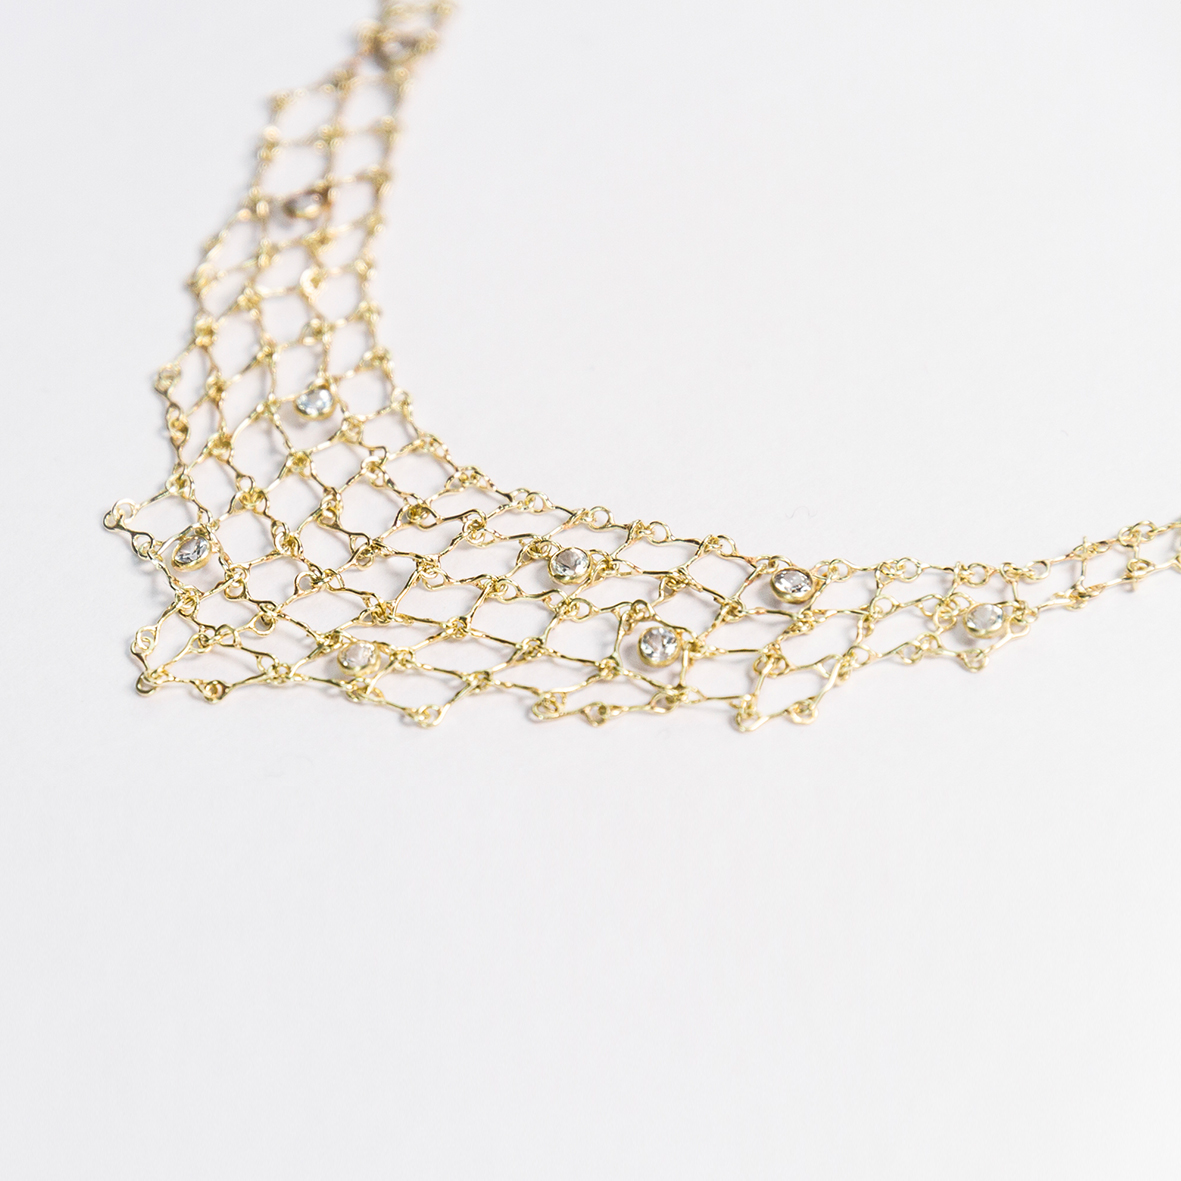 1. OONA_philo_principal_sapphire triangle net necklace